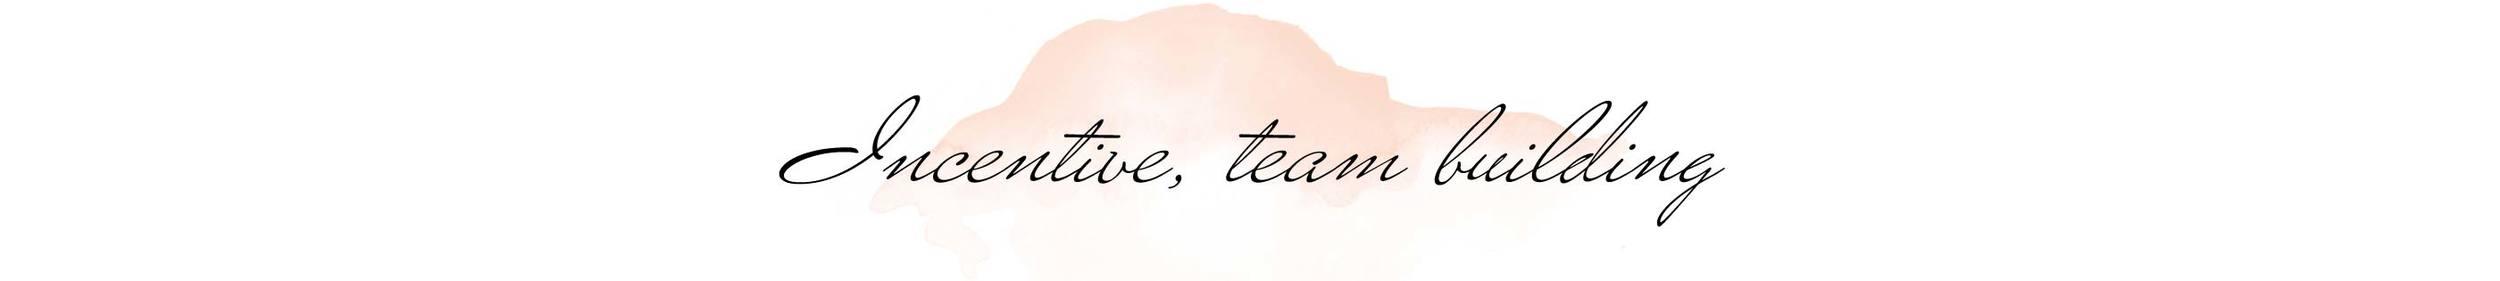 le_manoir_du_prince_incentive_team_building.jpg